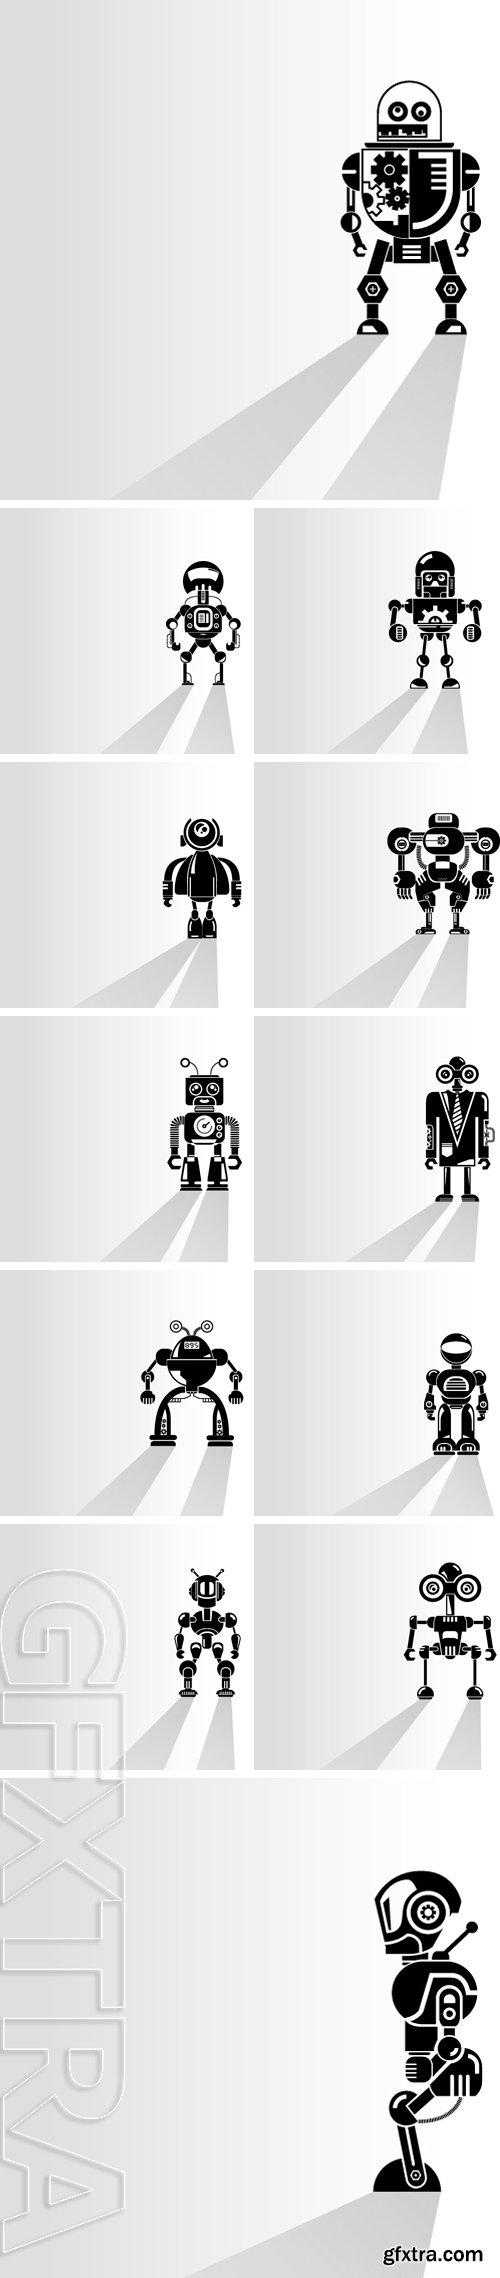 Stock Vectors -Cyborg, robot on white background, vector